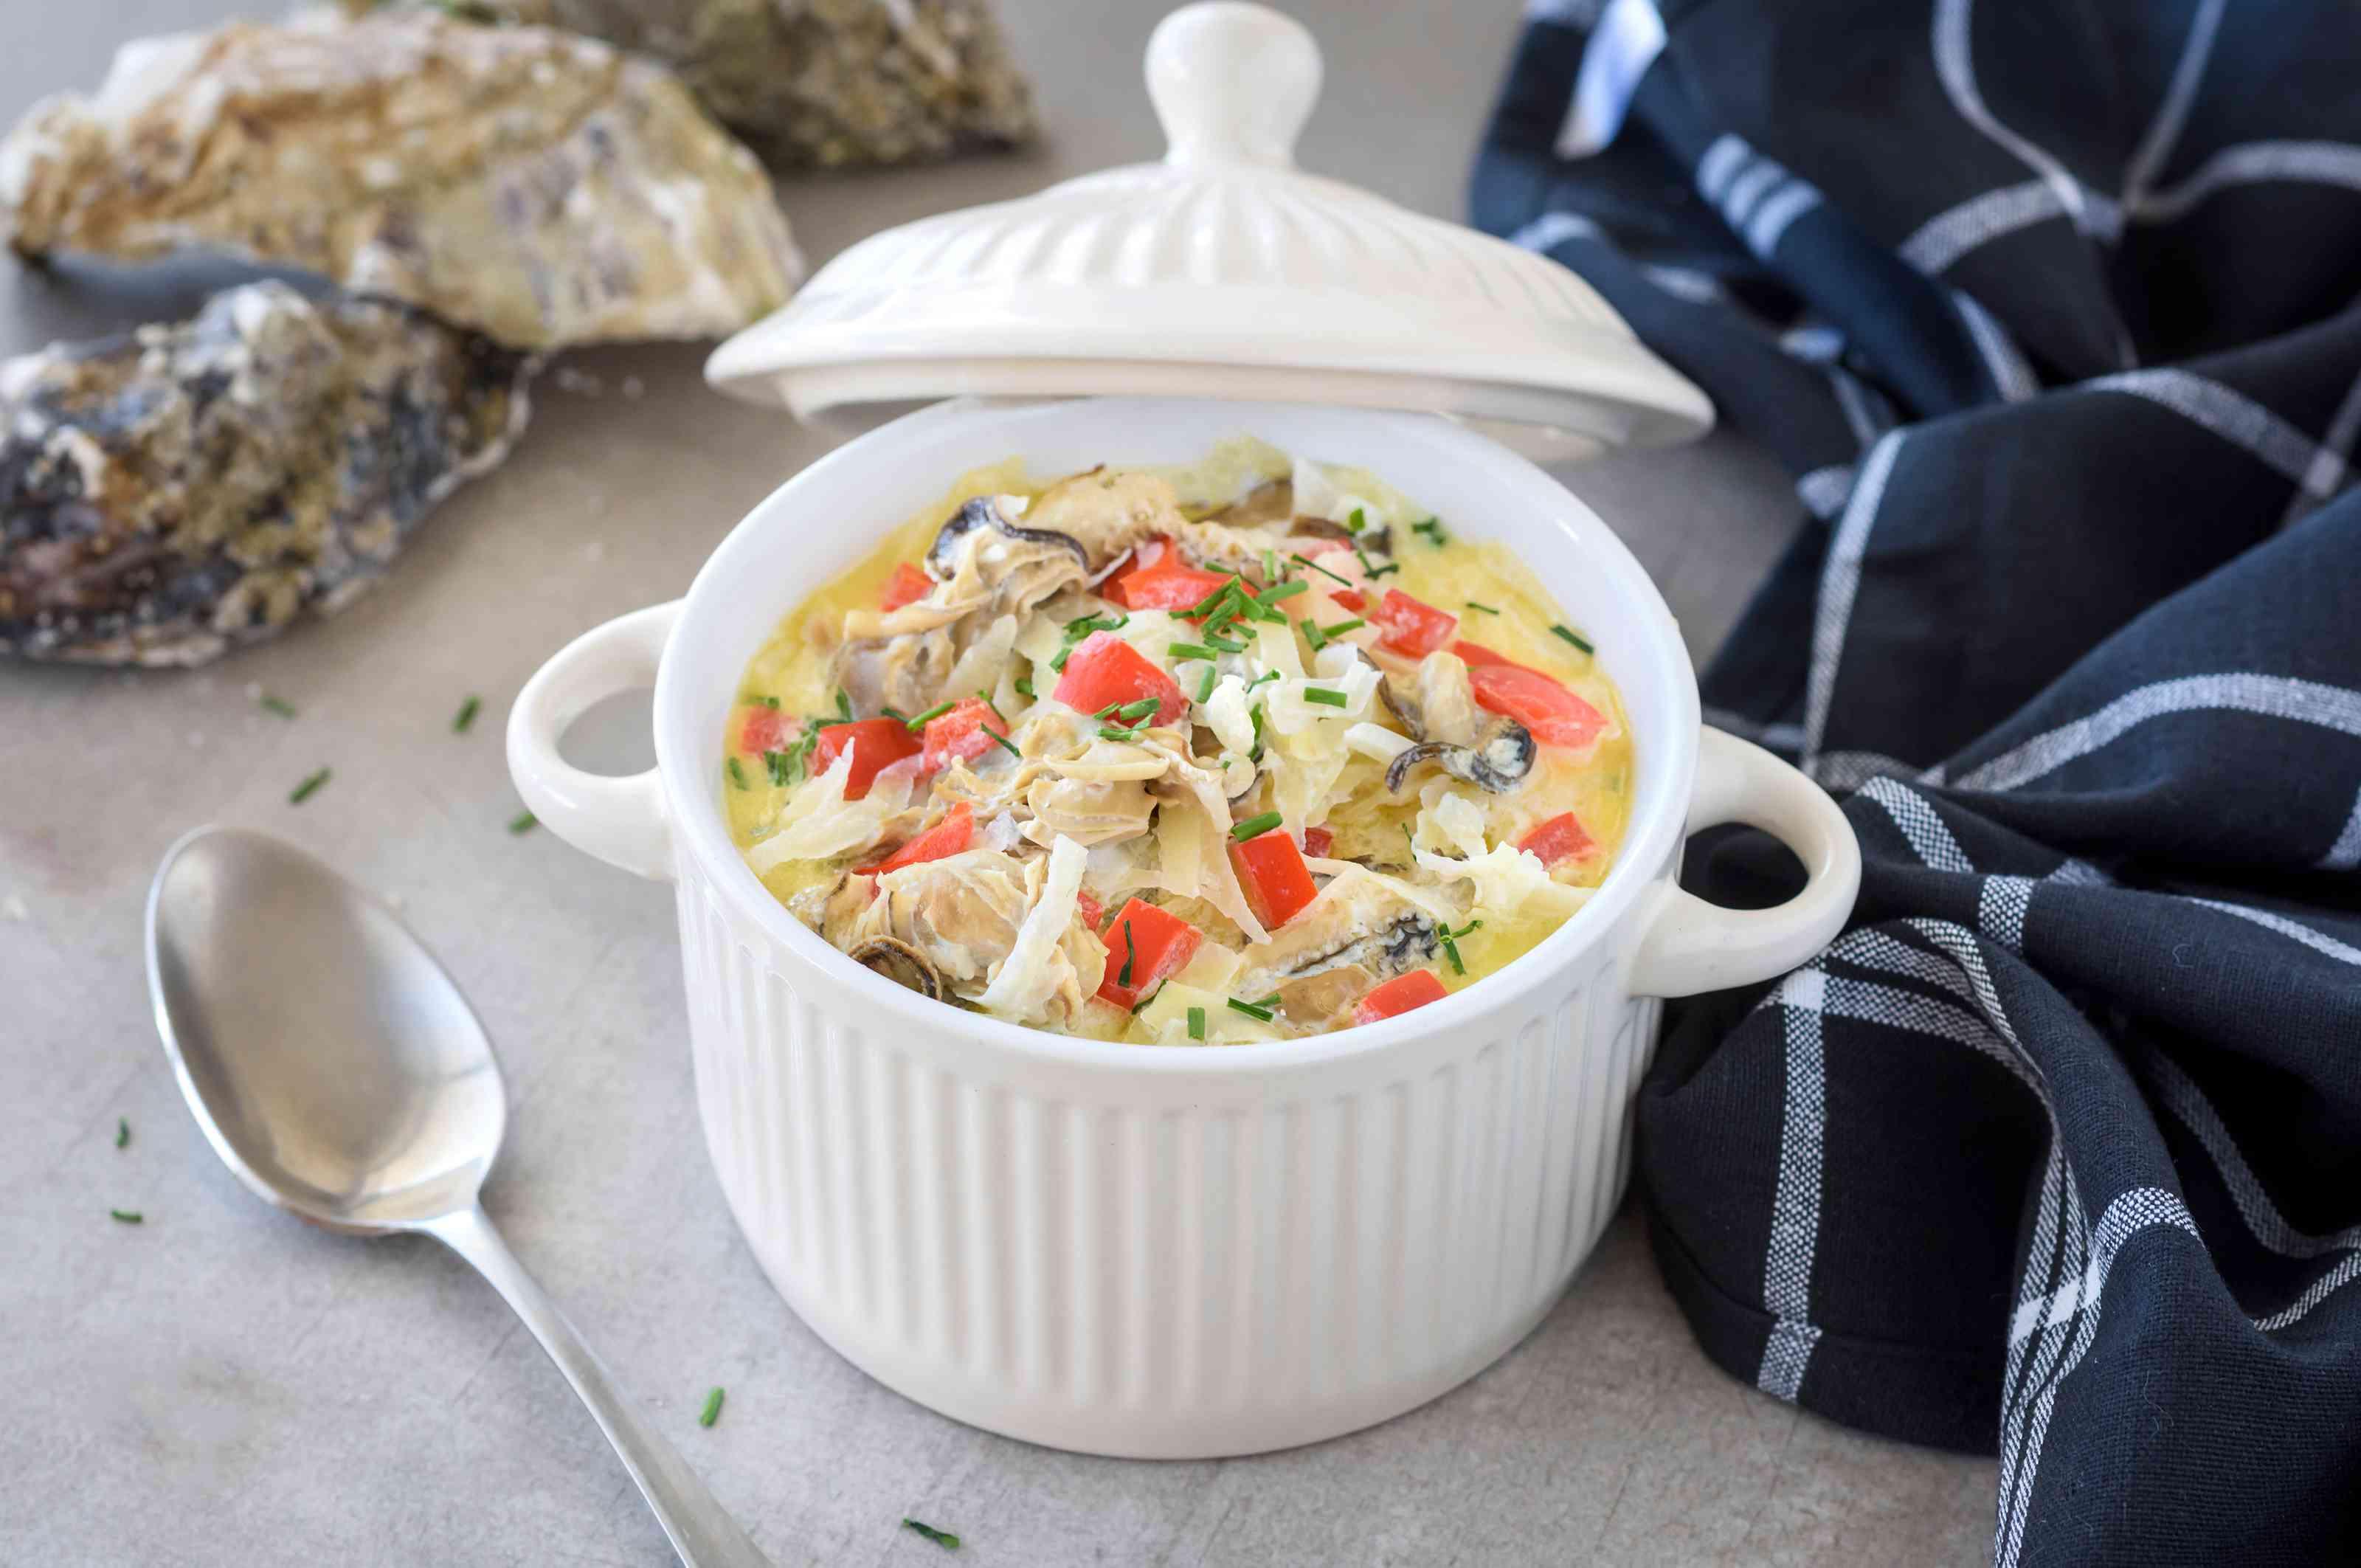 Crockpot oyster stew recipe